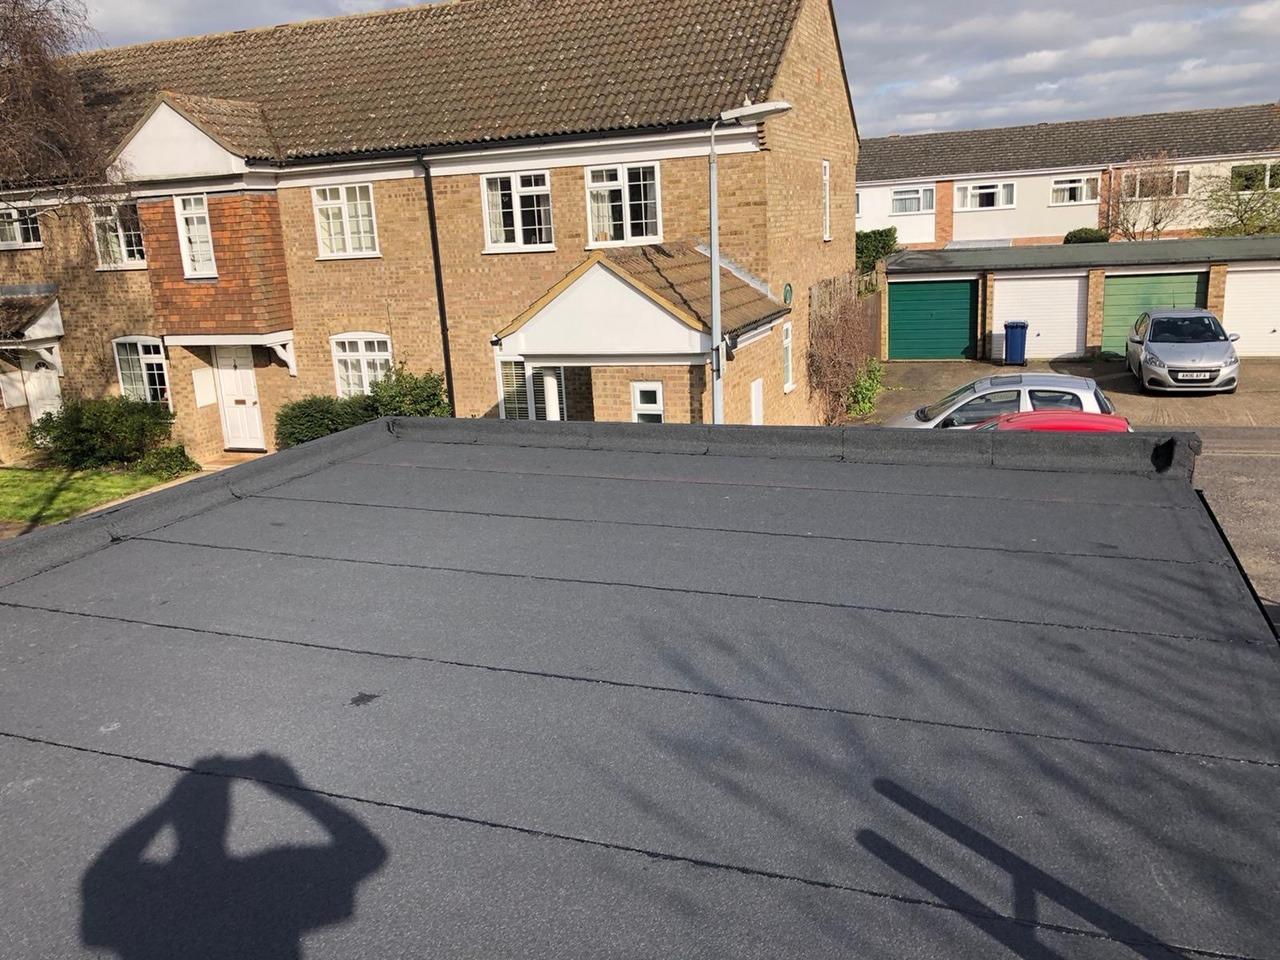 Garage roof rebuild and repair Cambridge